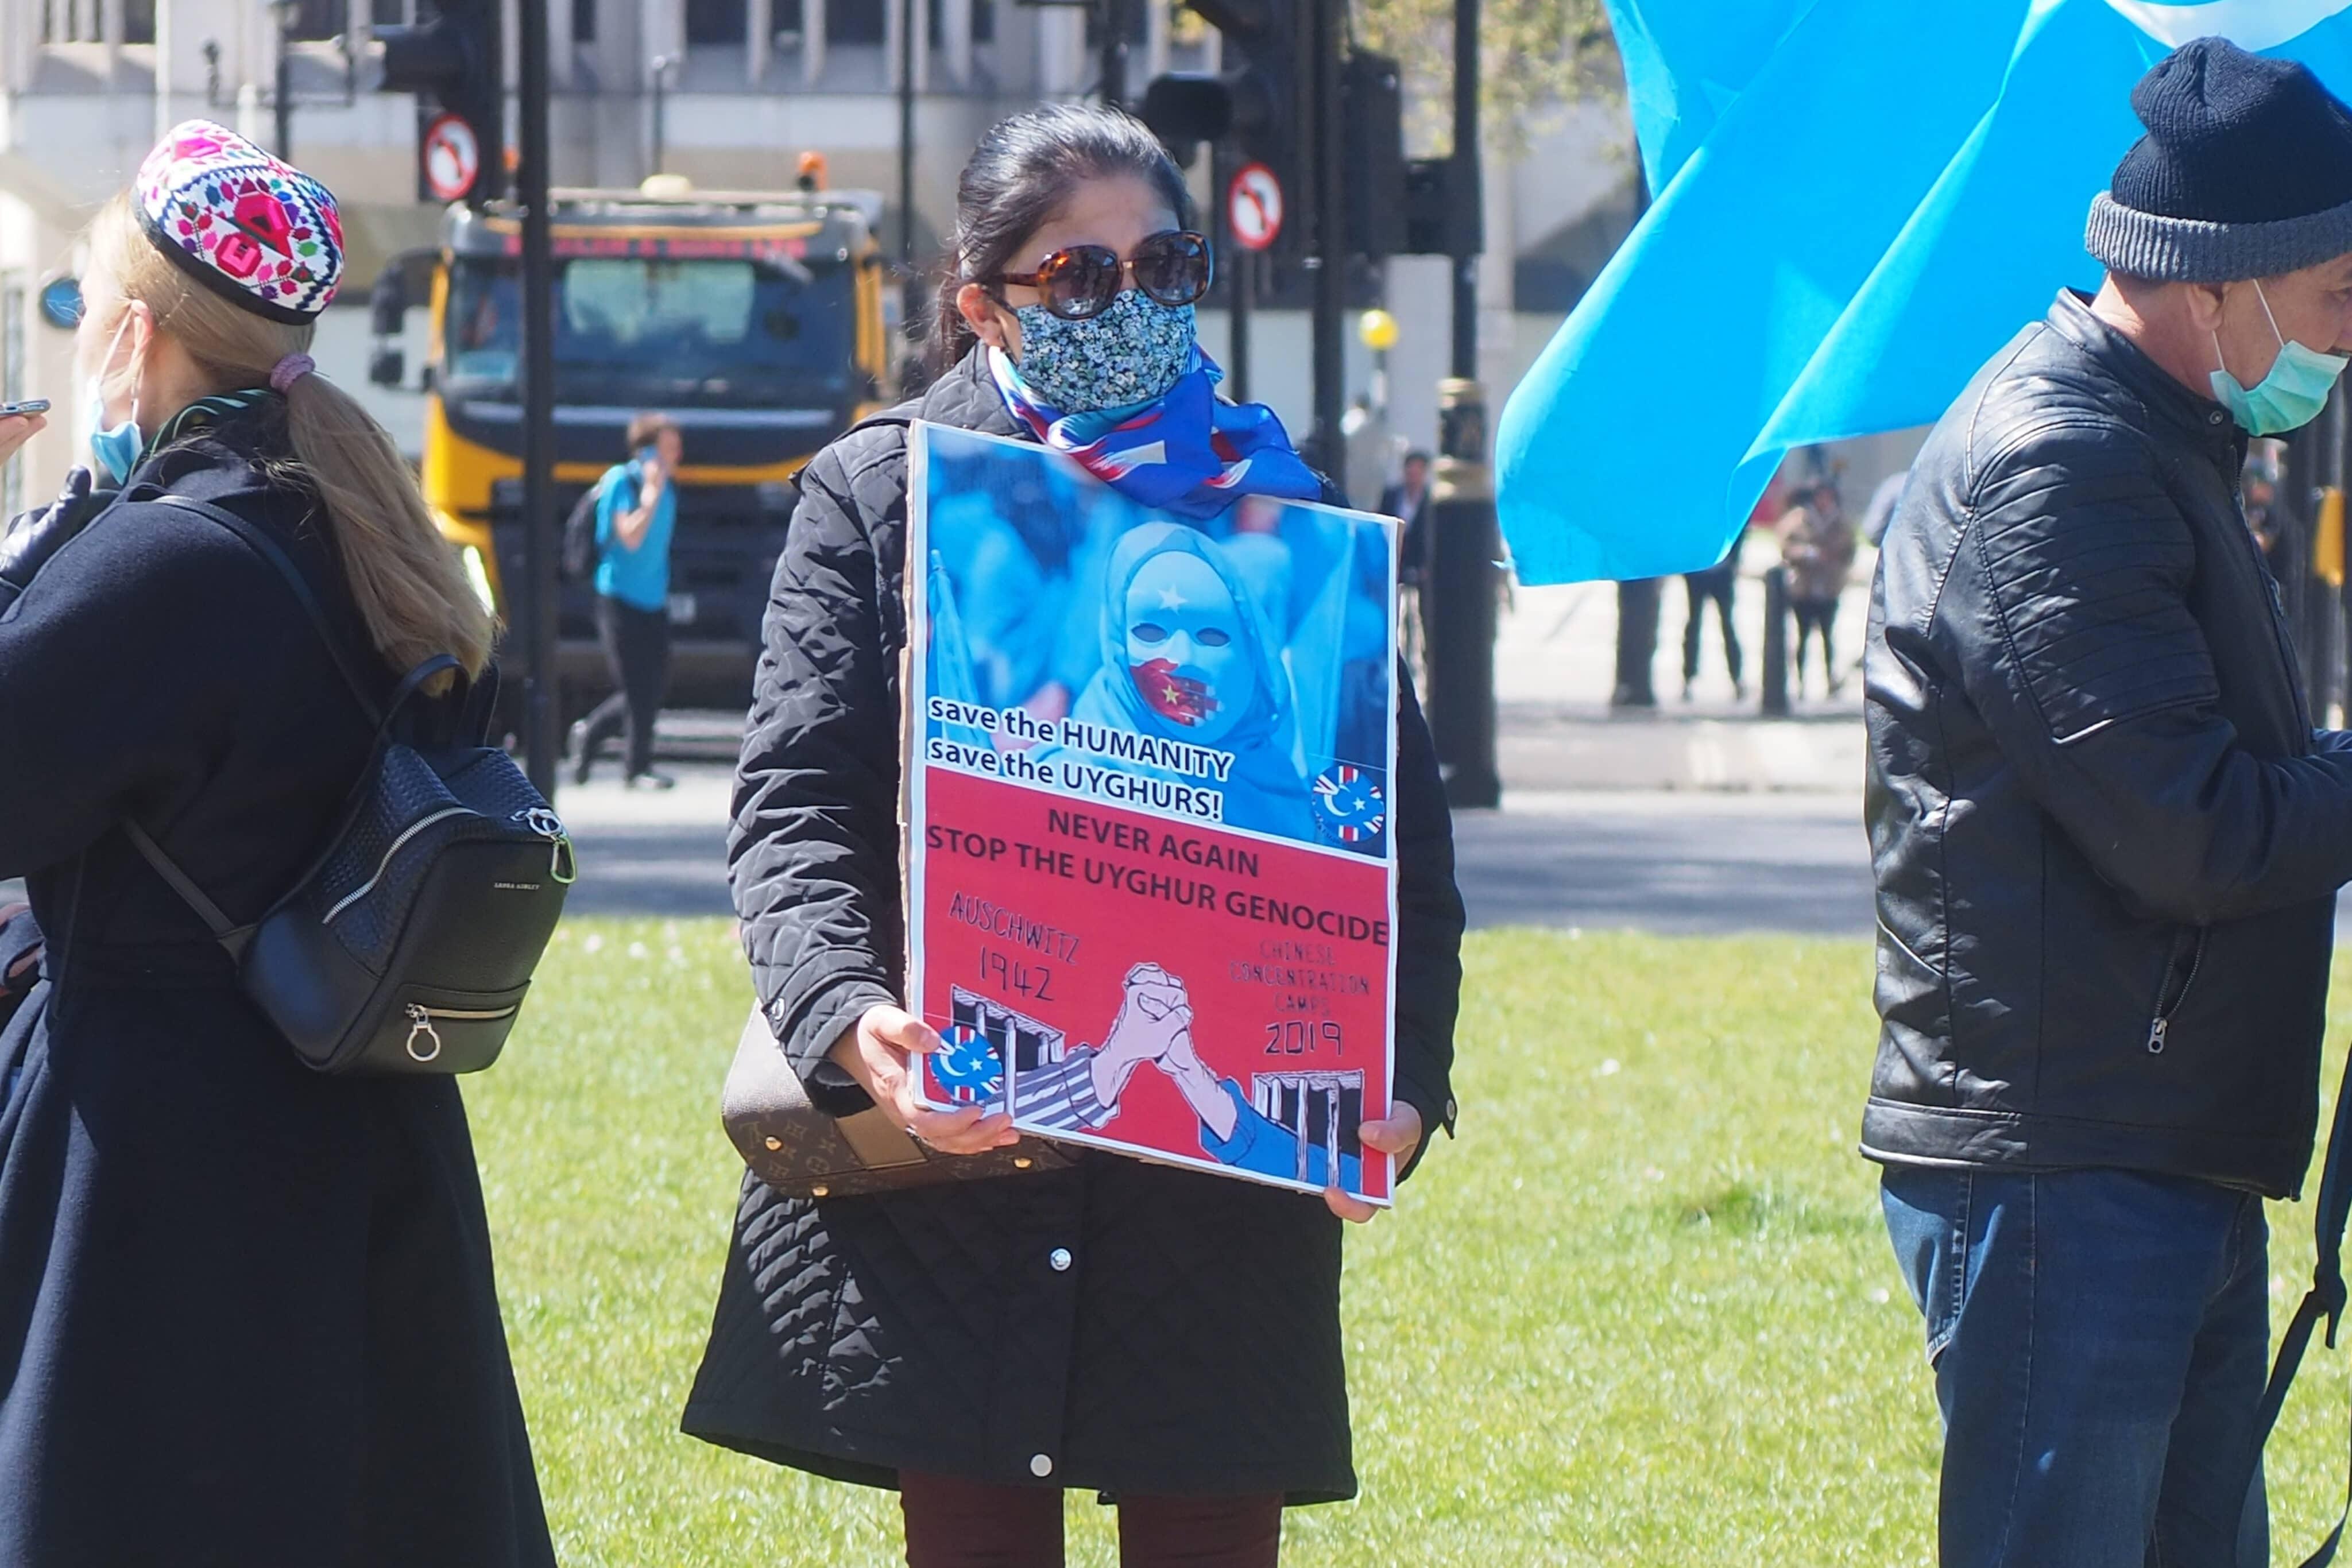 Protesto contra o genocídio de uigures na China